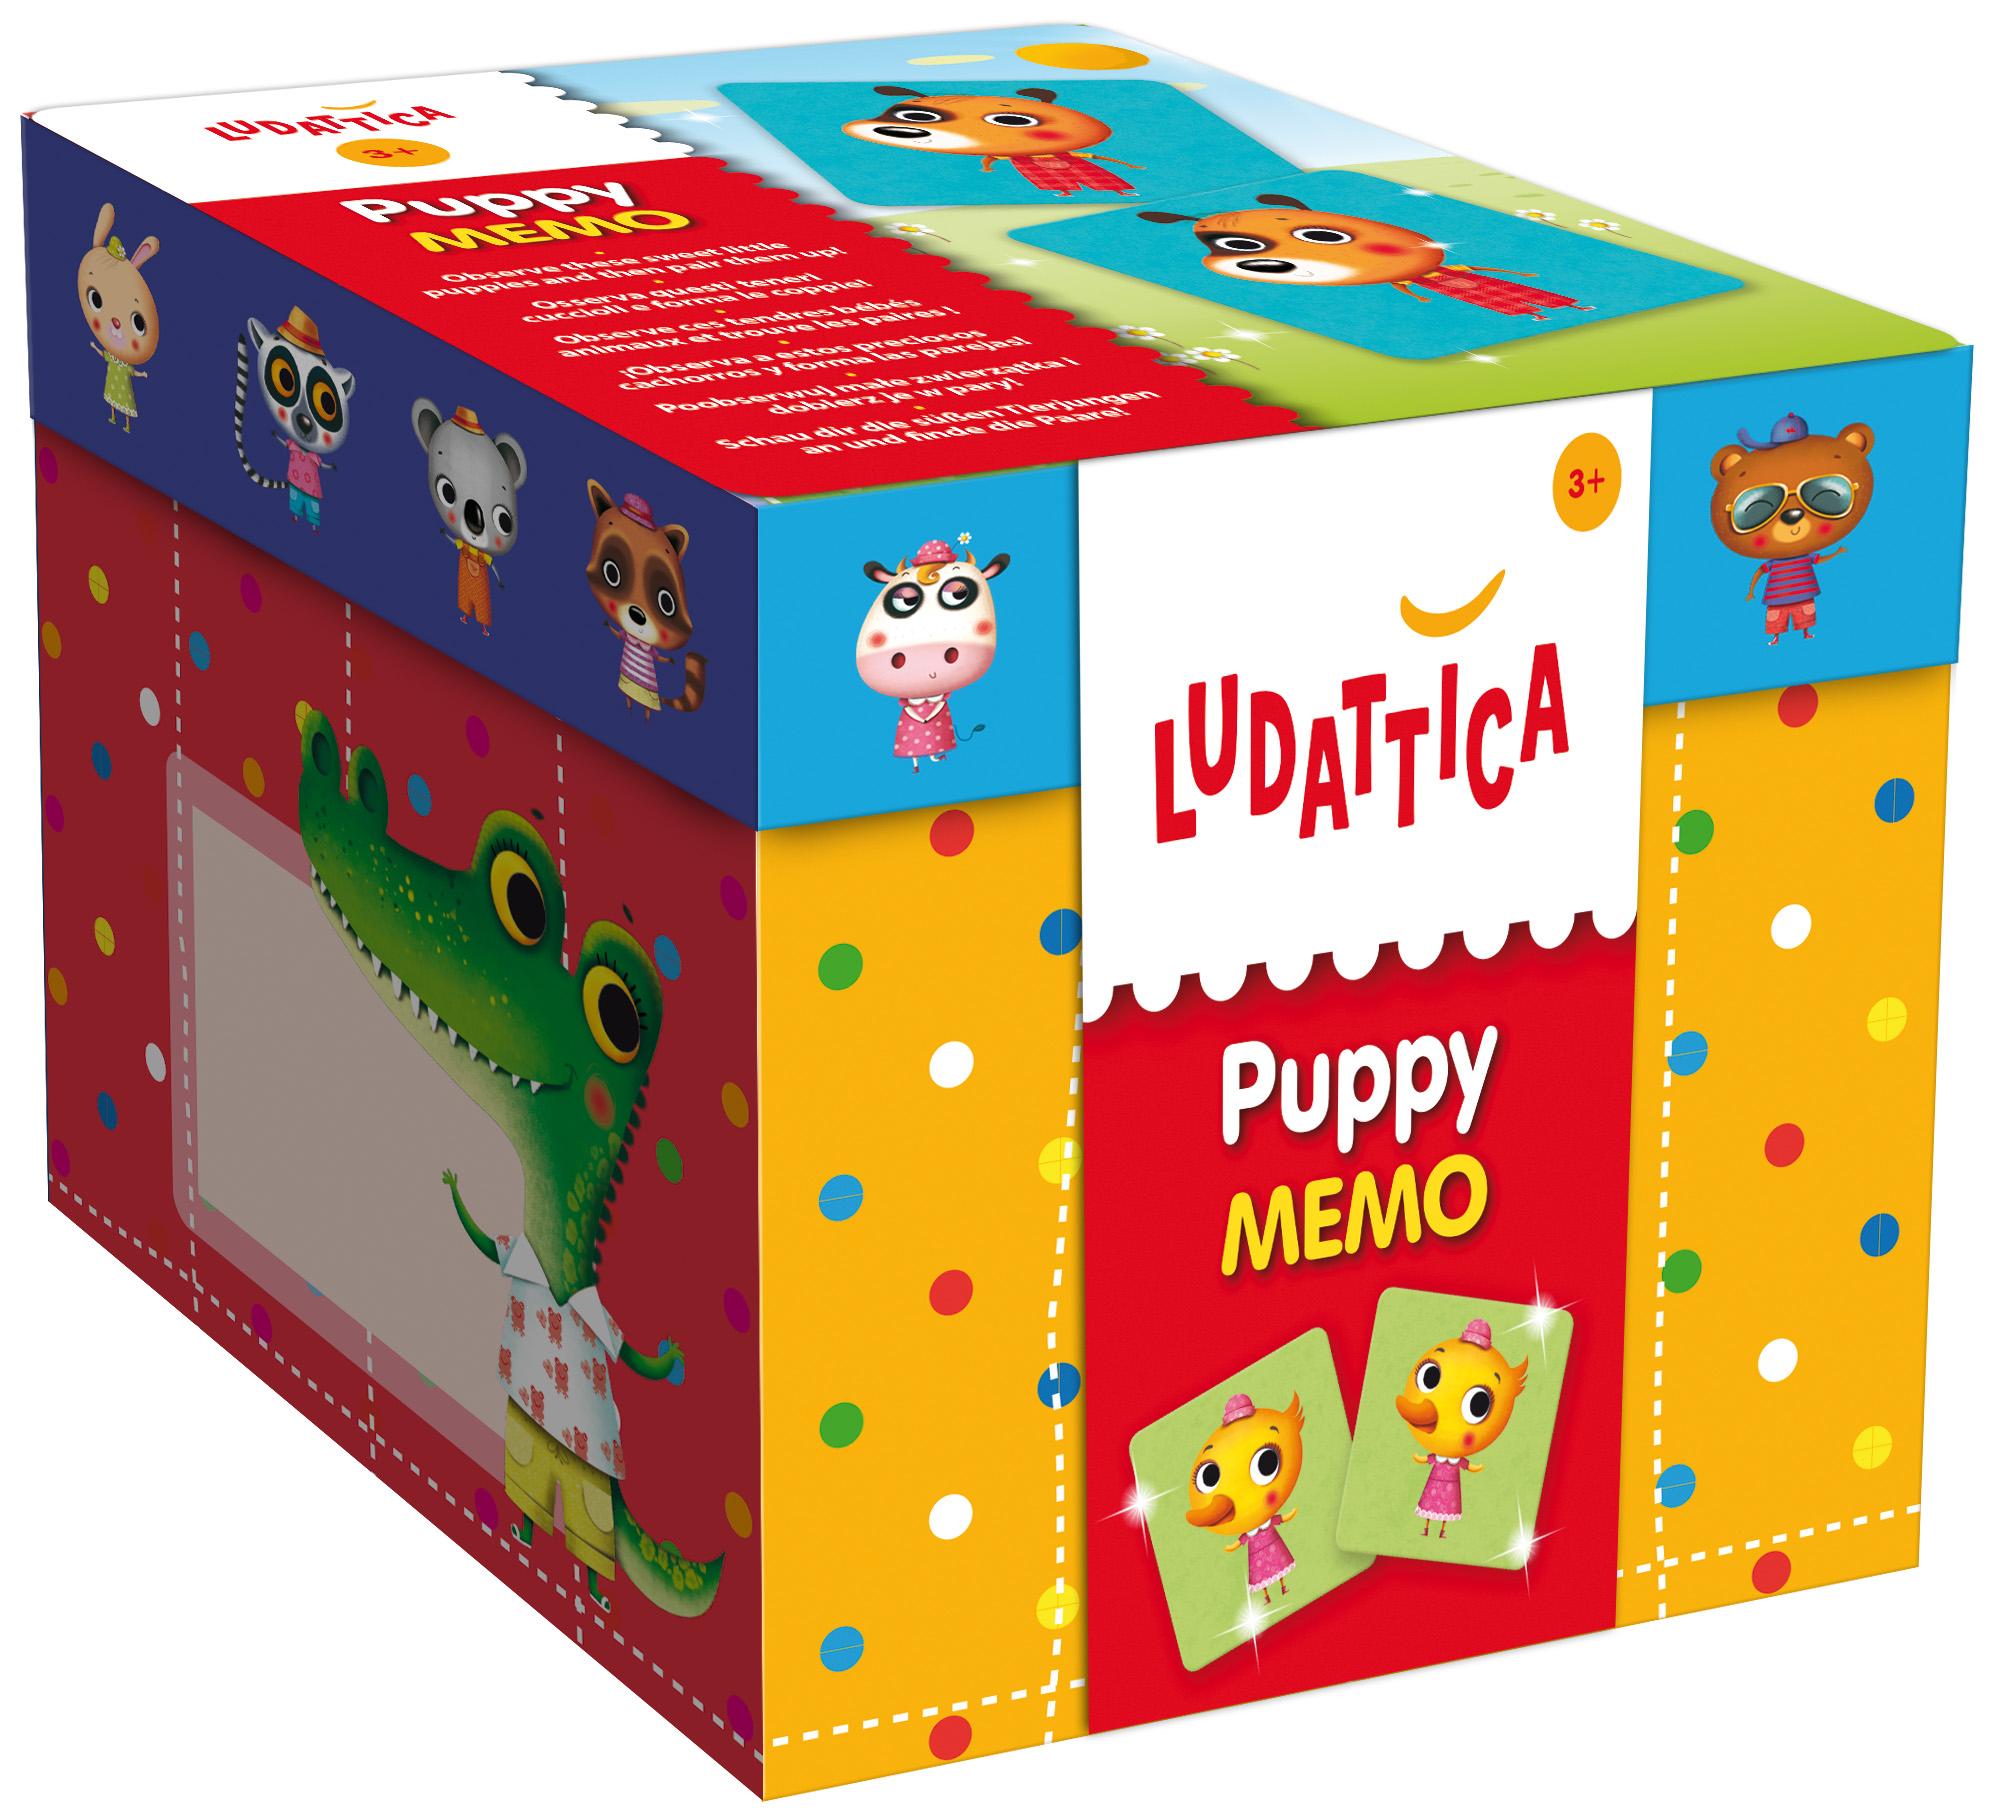 LUDATTICA Игра-мемори Детеныши животных ludattica игра развивающая 3 в 1 город